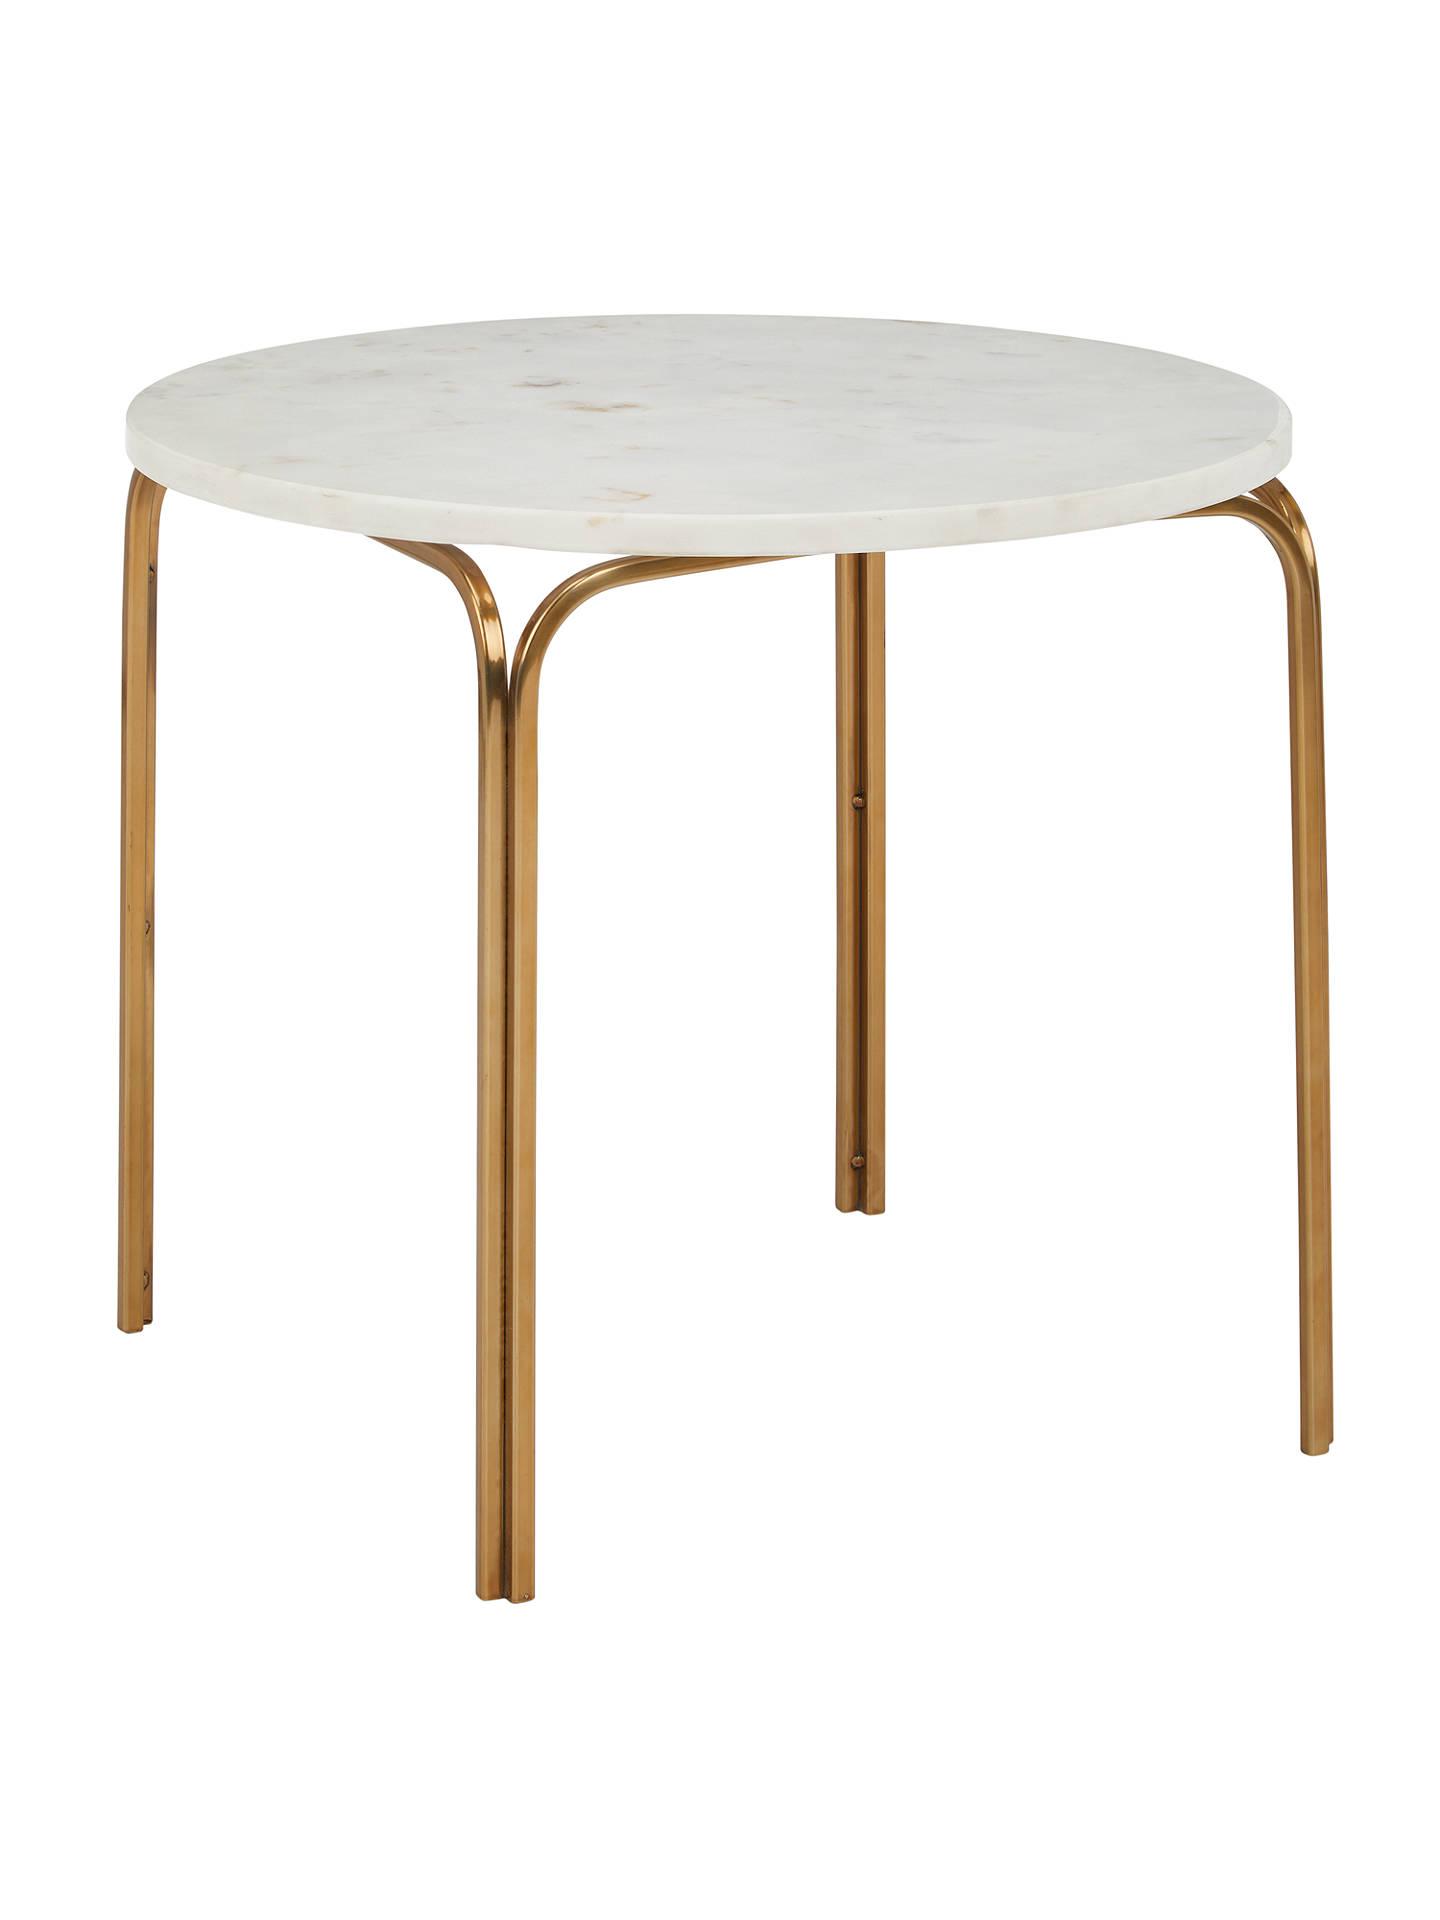 john lewis partners azra marble side table at john lewis. Black Bedroom Furniture Sets. Home Design Ideas